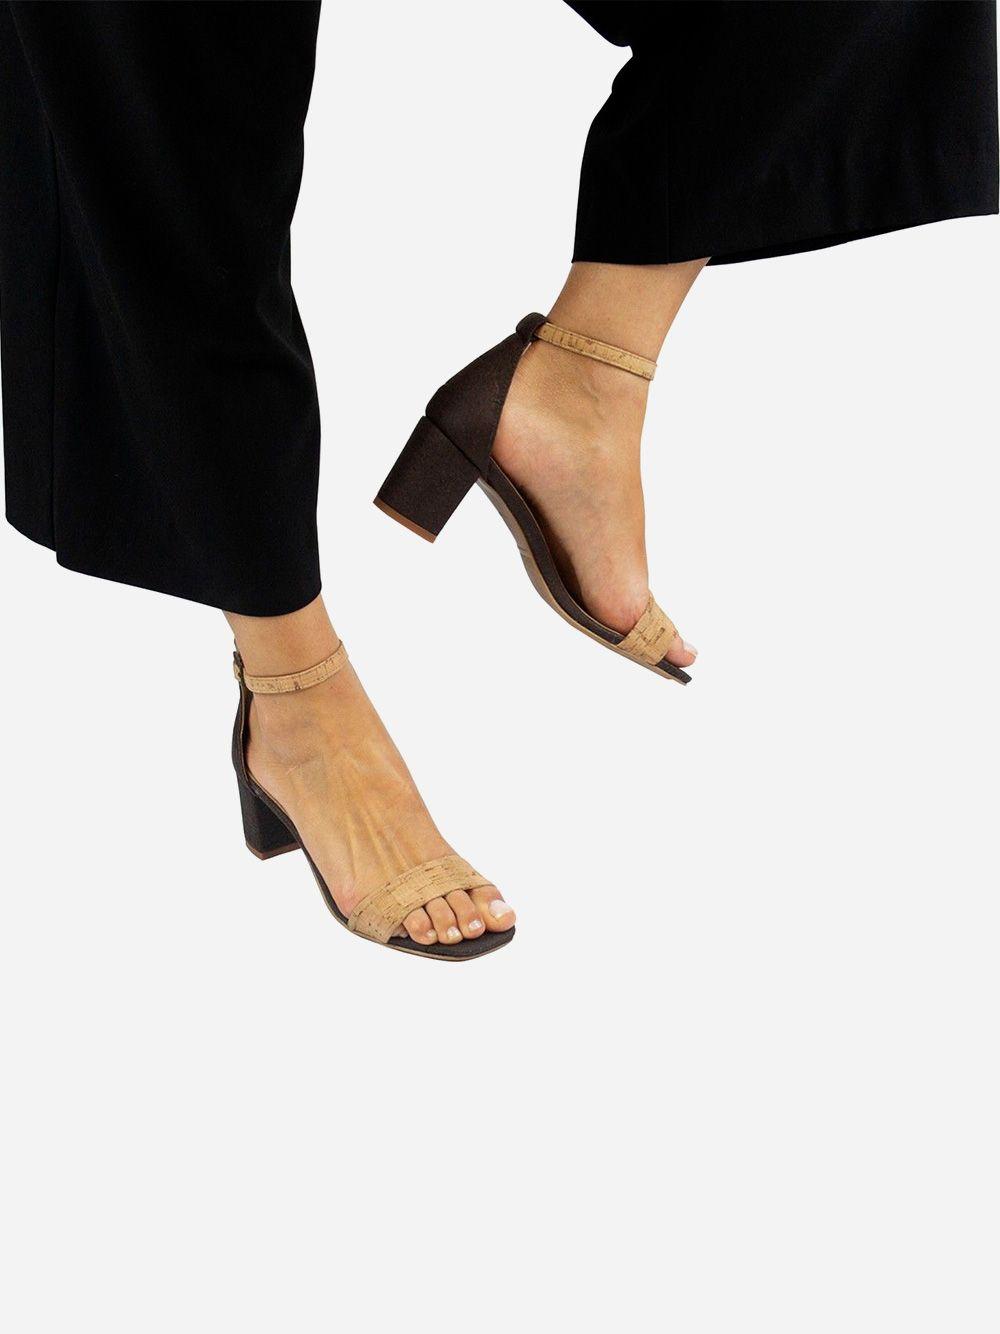 Sandálias Piñatex Margot   Nae